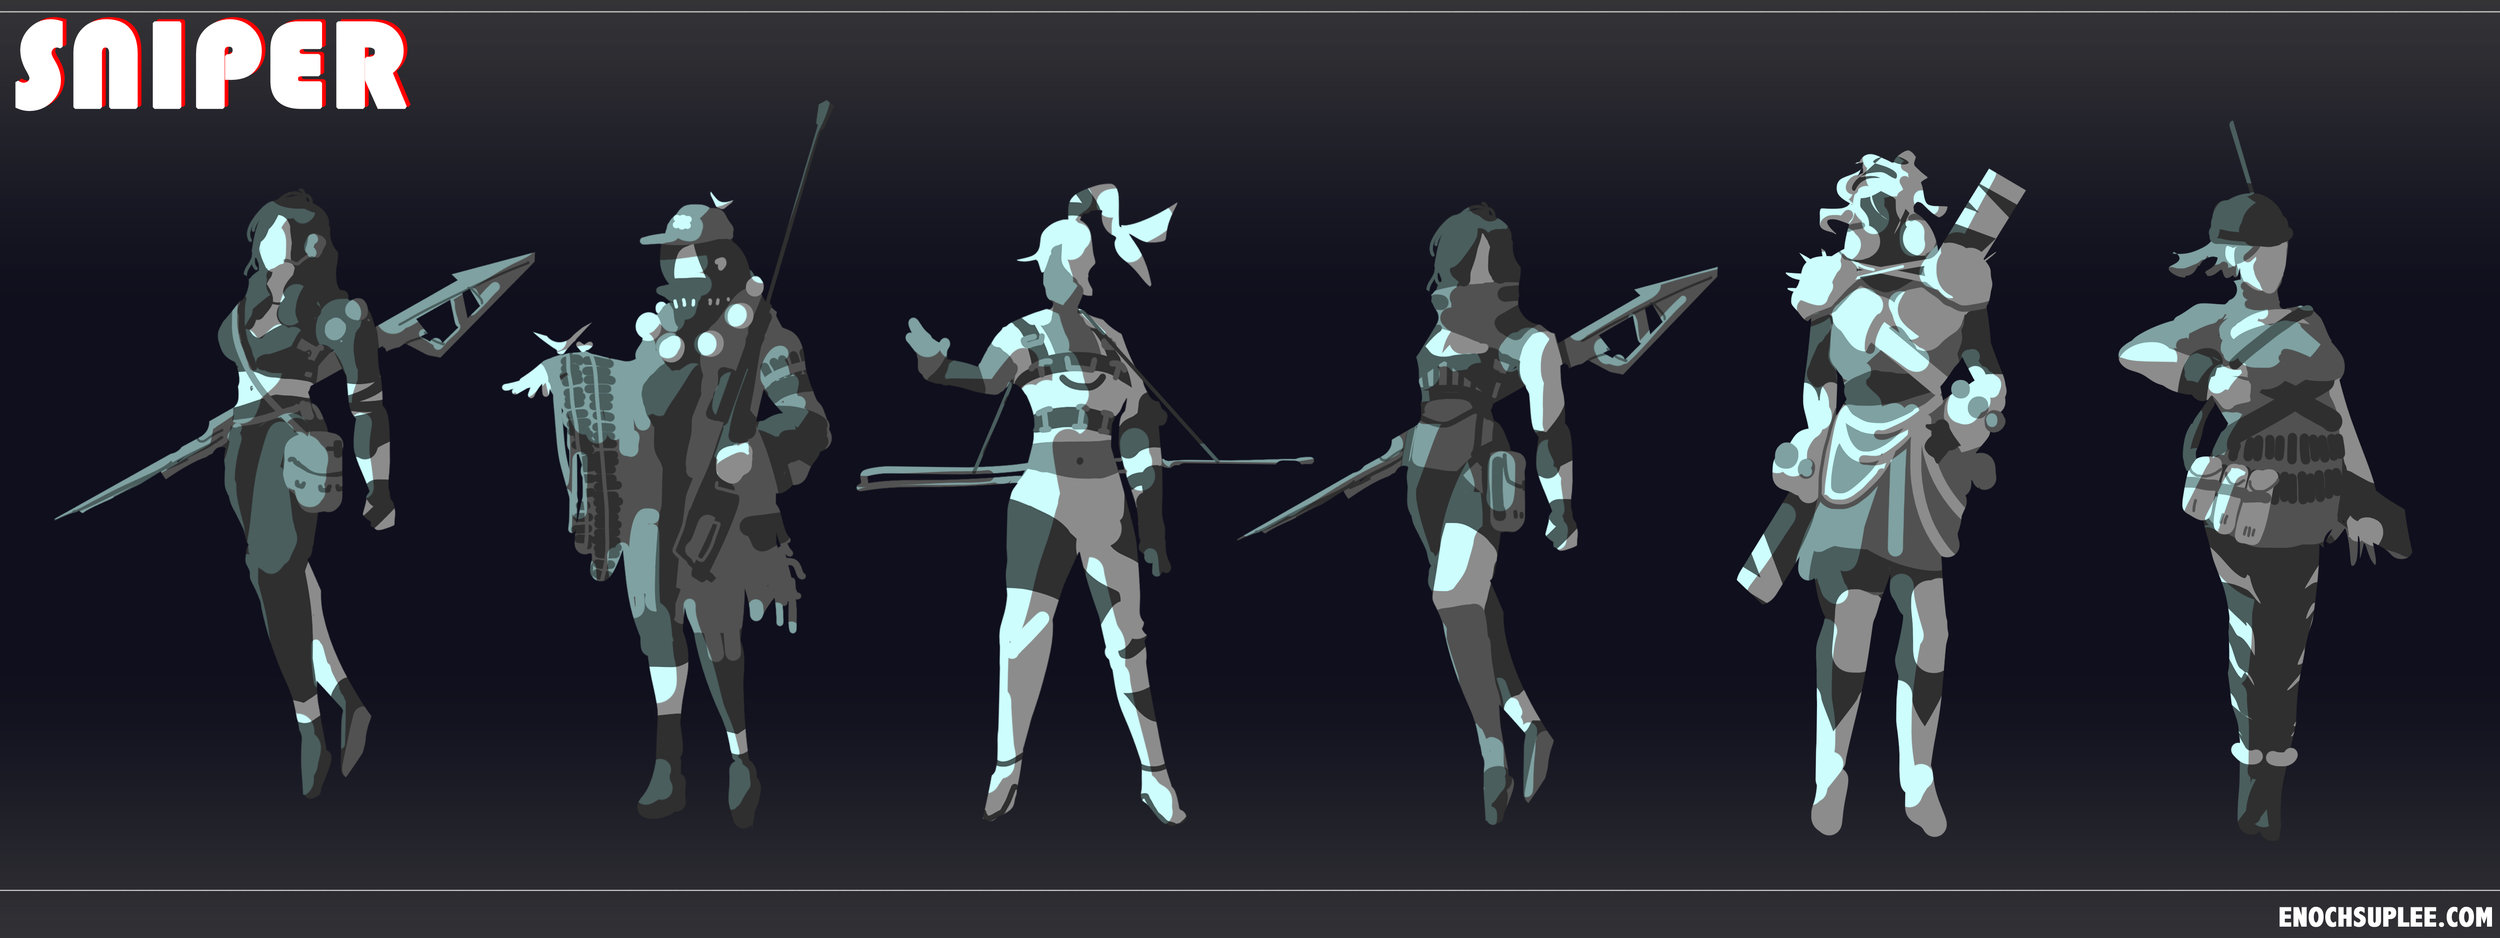 sniper thumbs.jpg